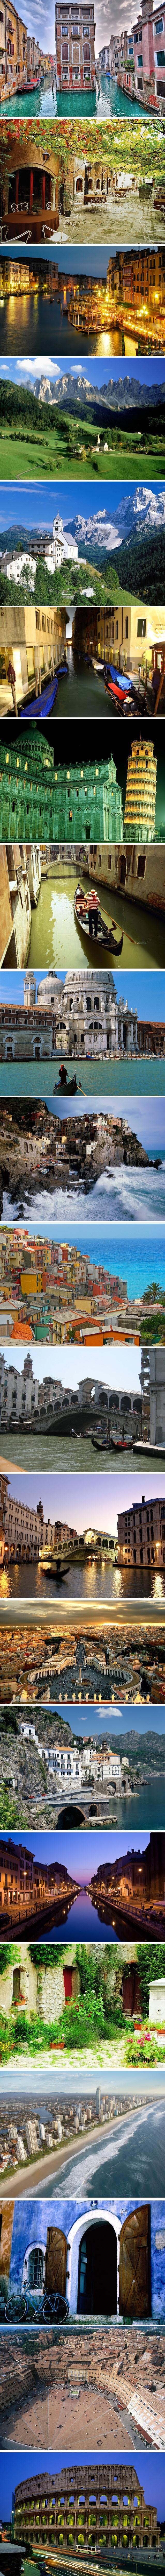 Amazing shots of Italy.